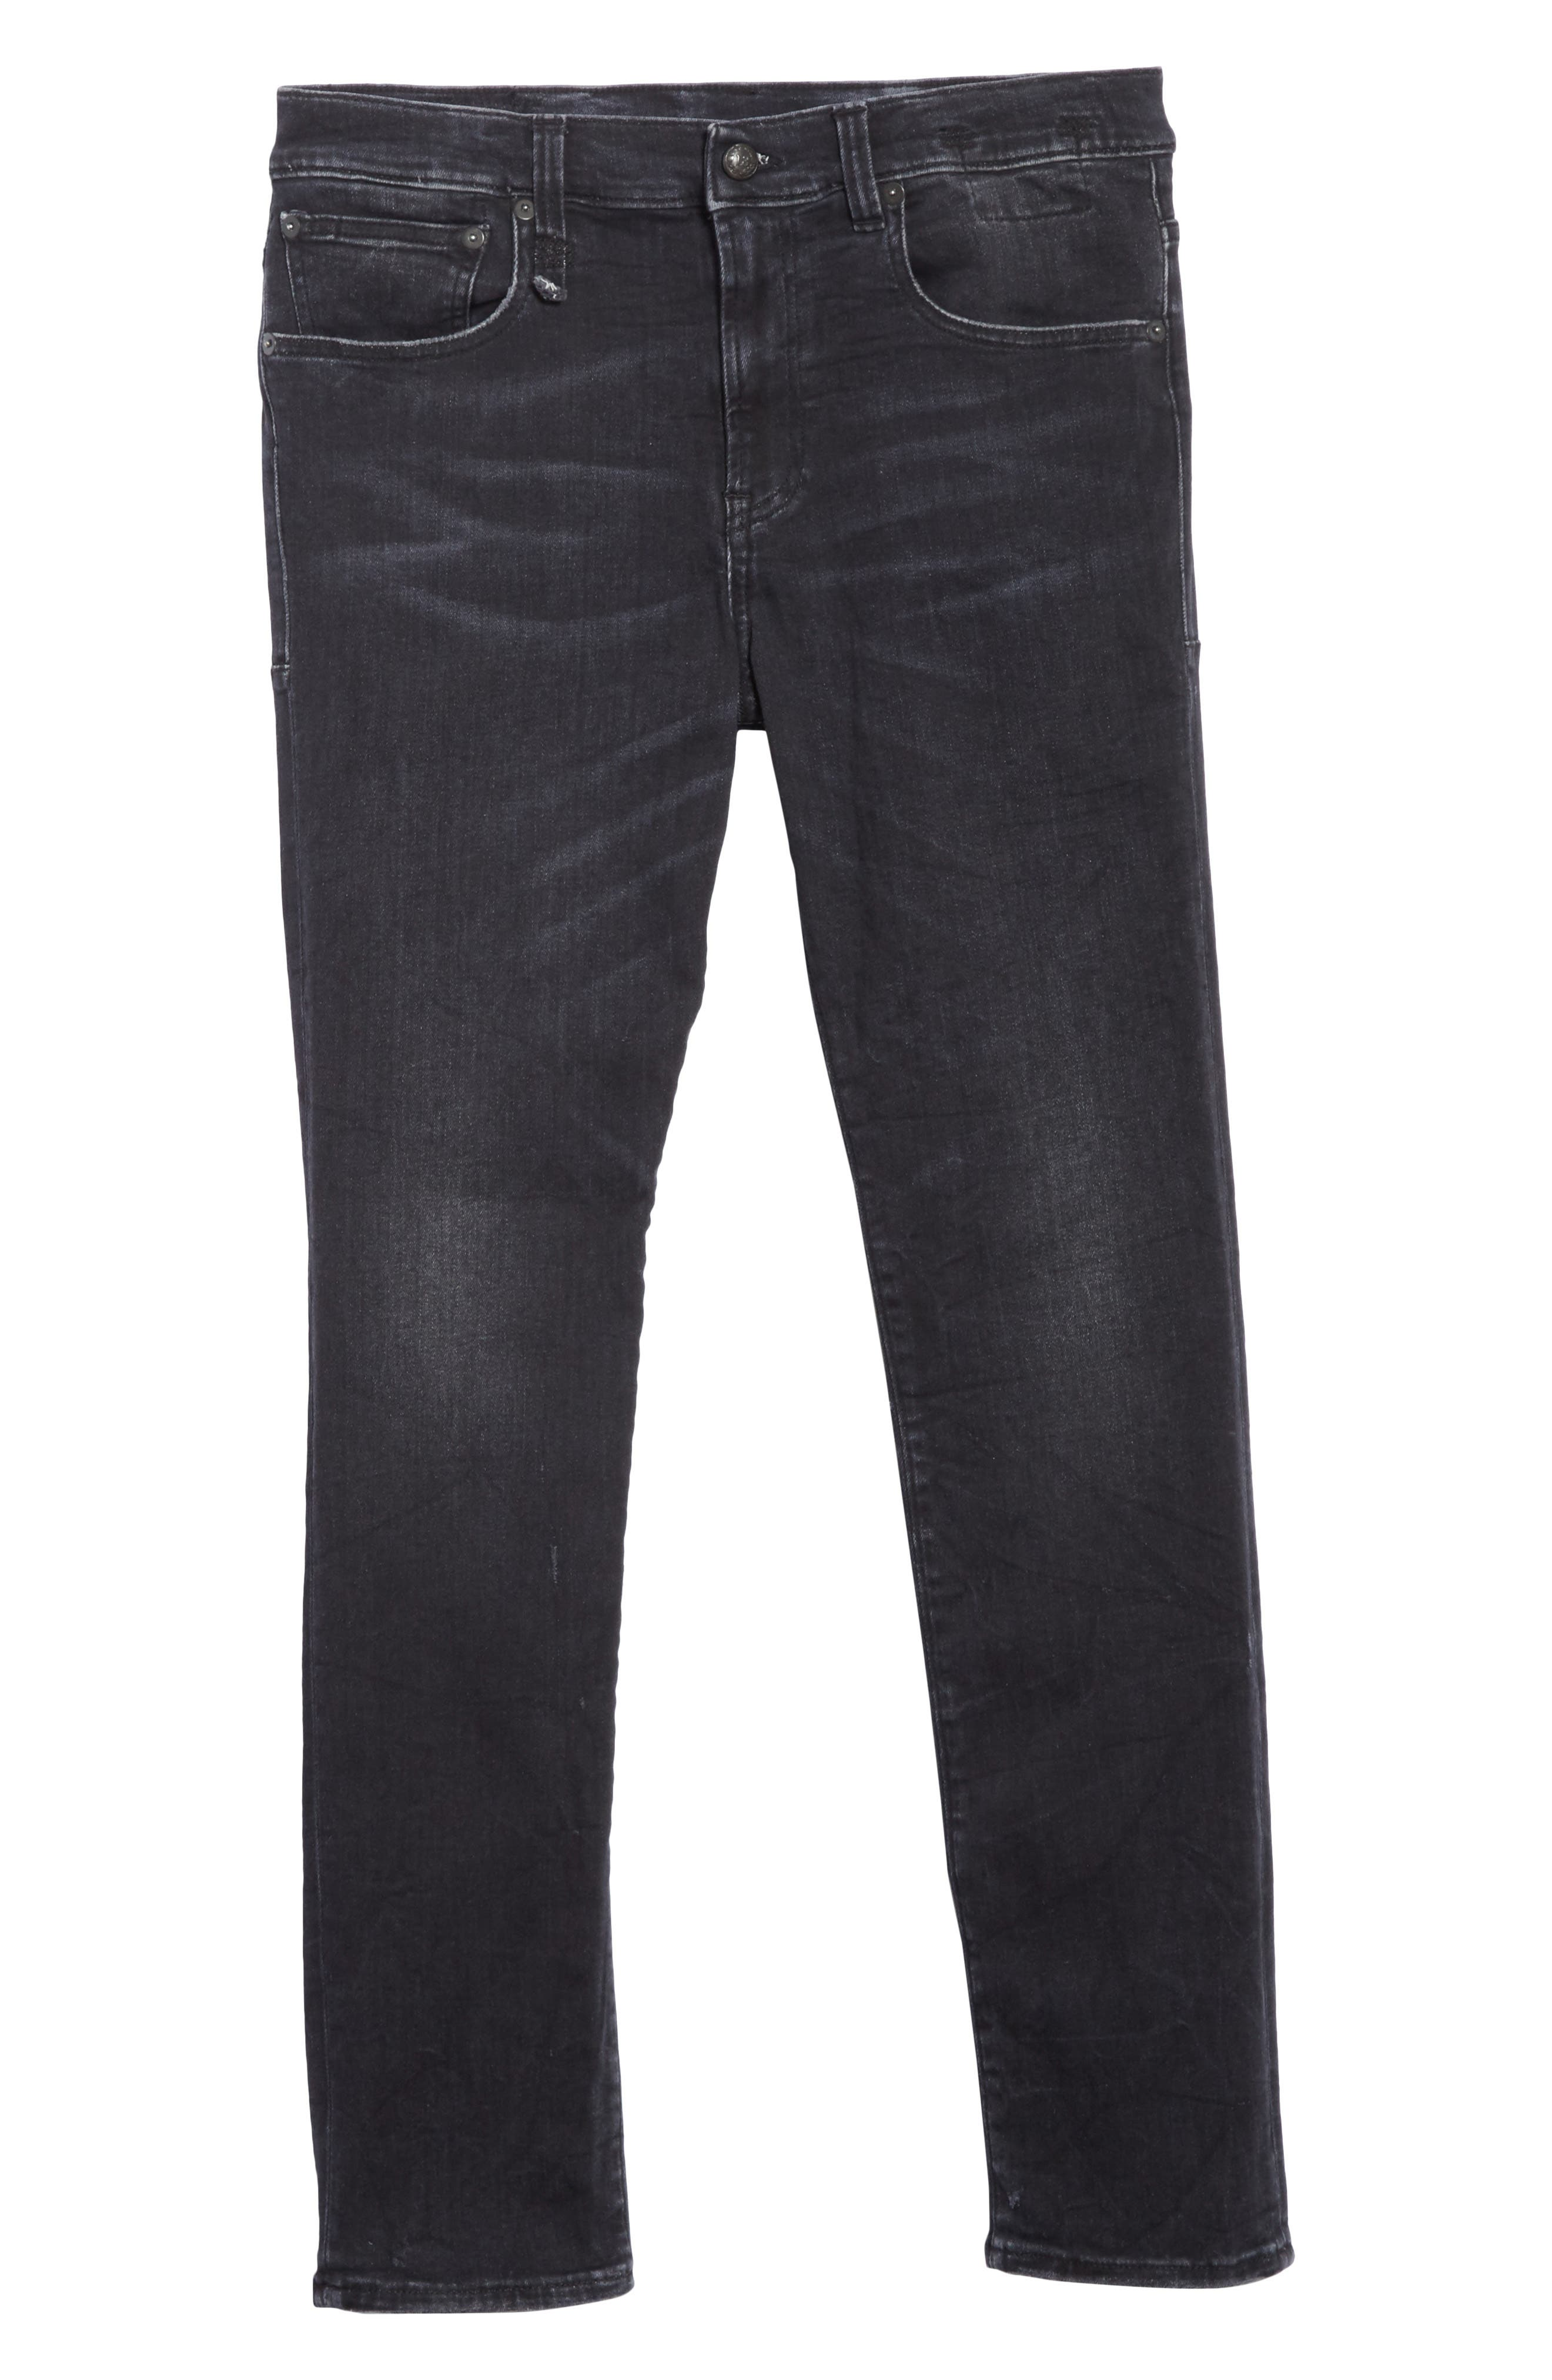 Skate Jeans,                             Alternate thumbnail 6, color,                             BLACK MARBLE